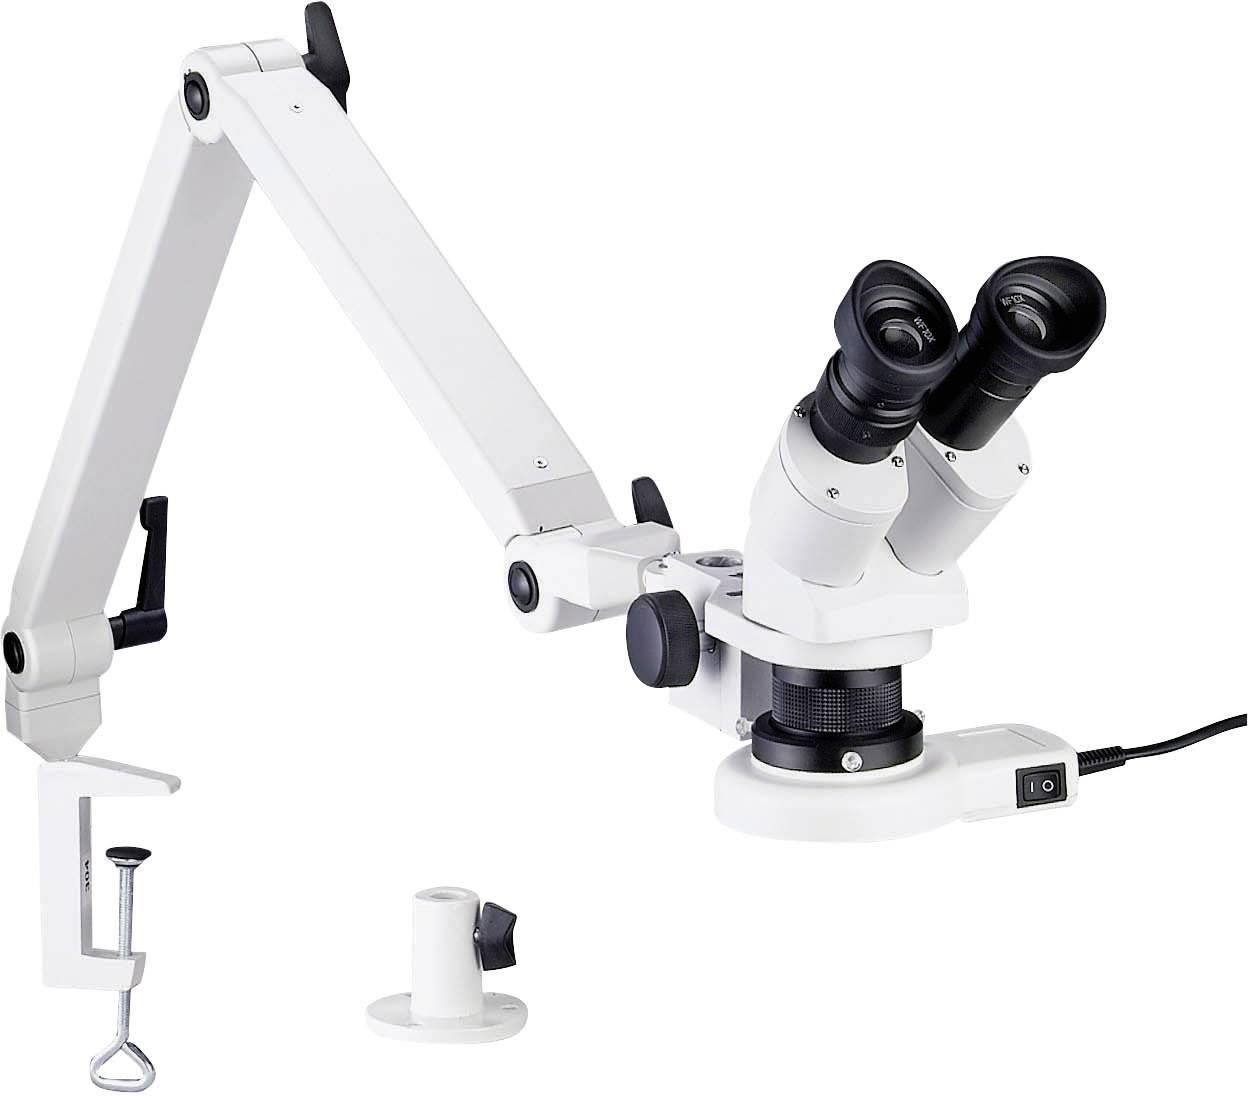 Stereomikroskop Bernstein 9-158, binokulárny, 20 x